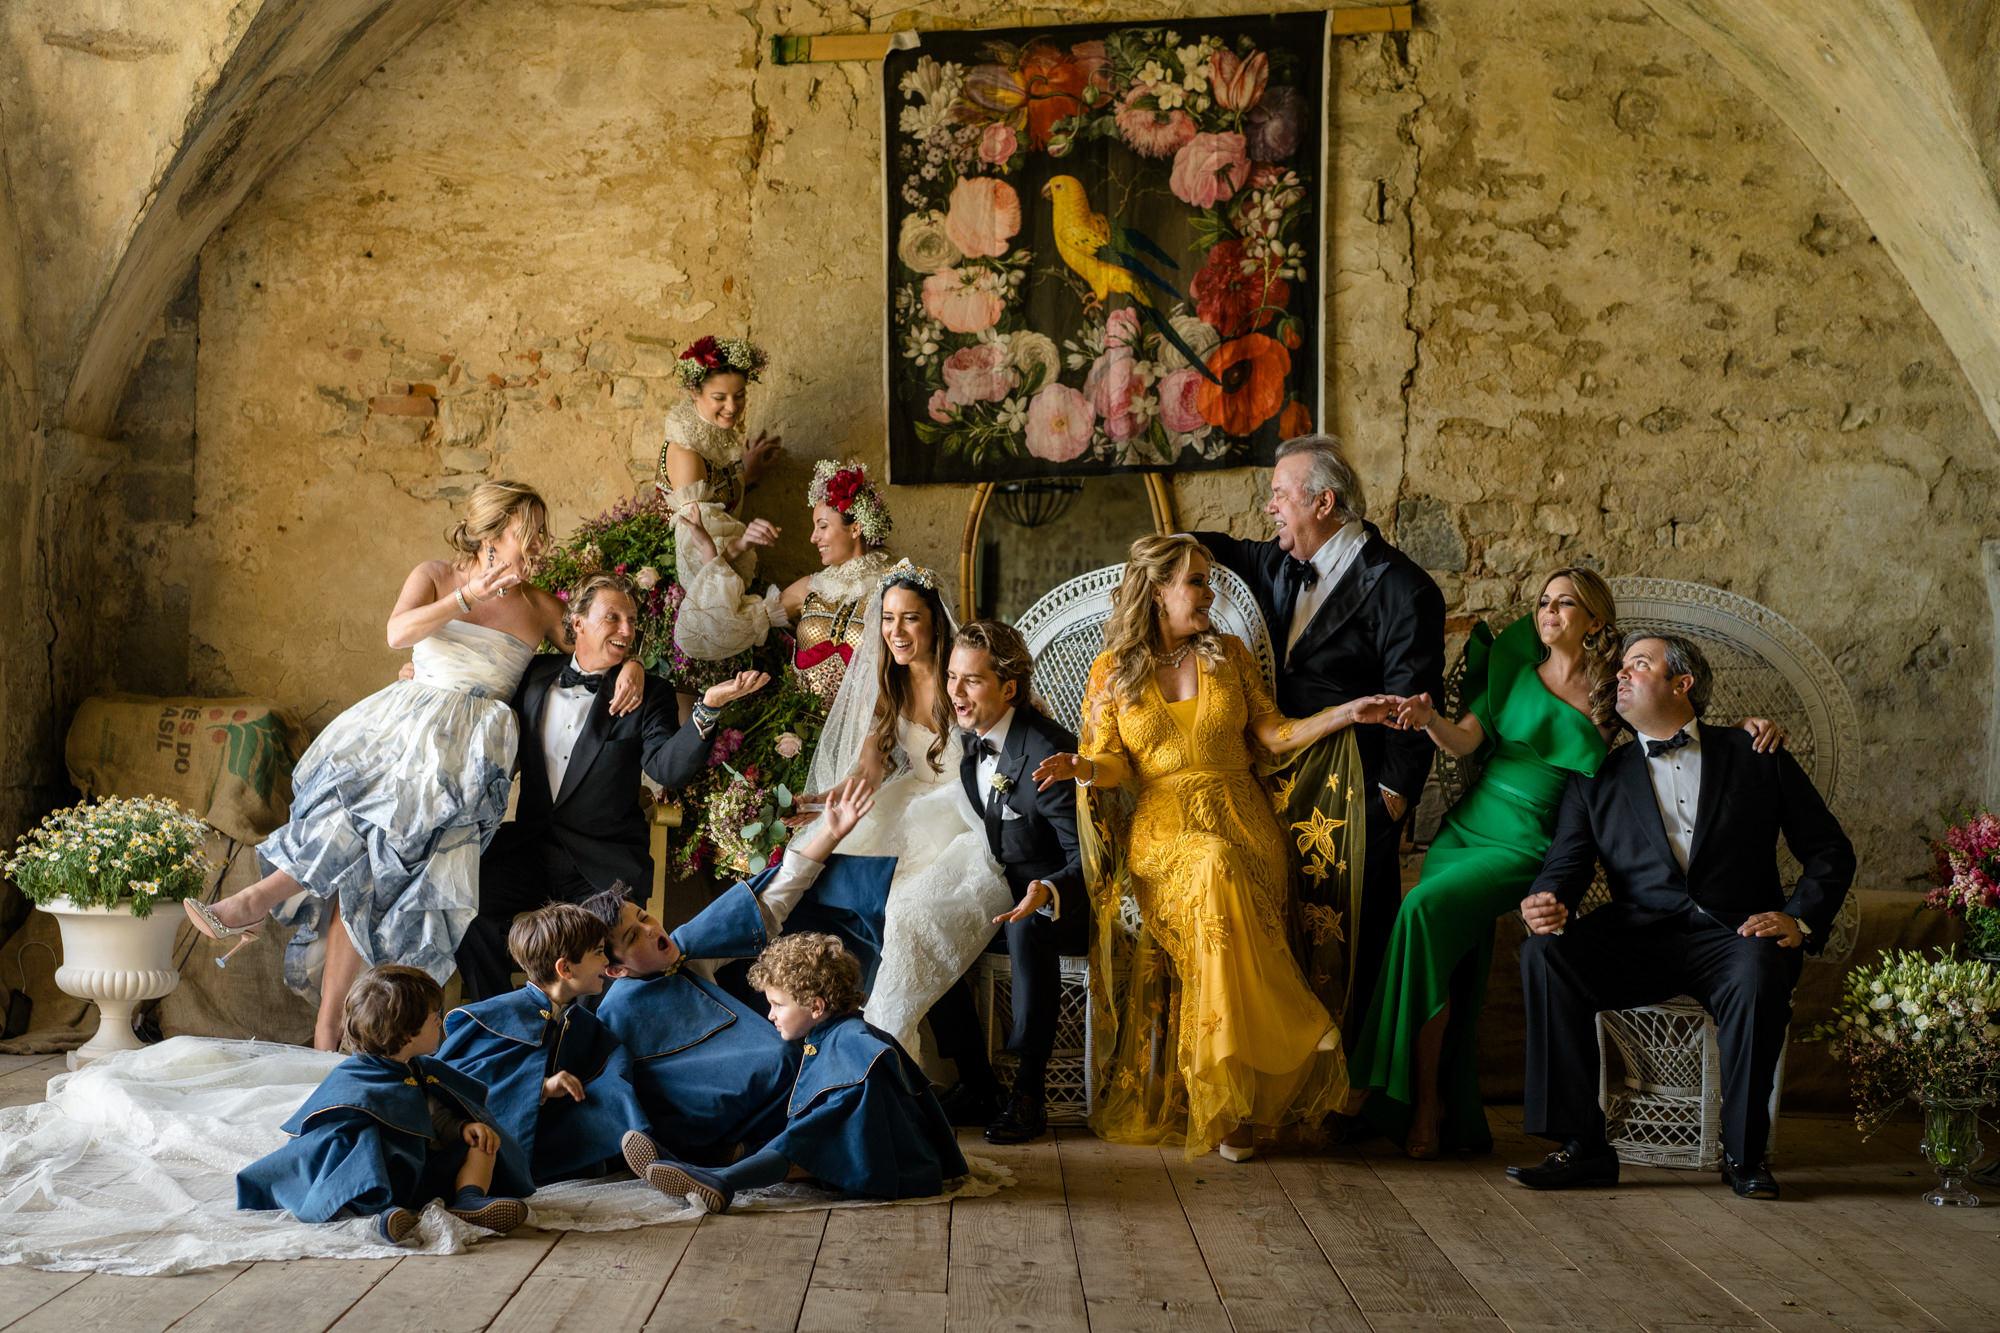 theatre-themed-bridal-party-gold-green-blue-attire-worlds-best-wedding-photos-david-bastianoni-italy-wedding-photographers